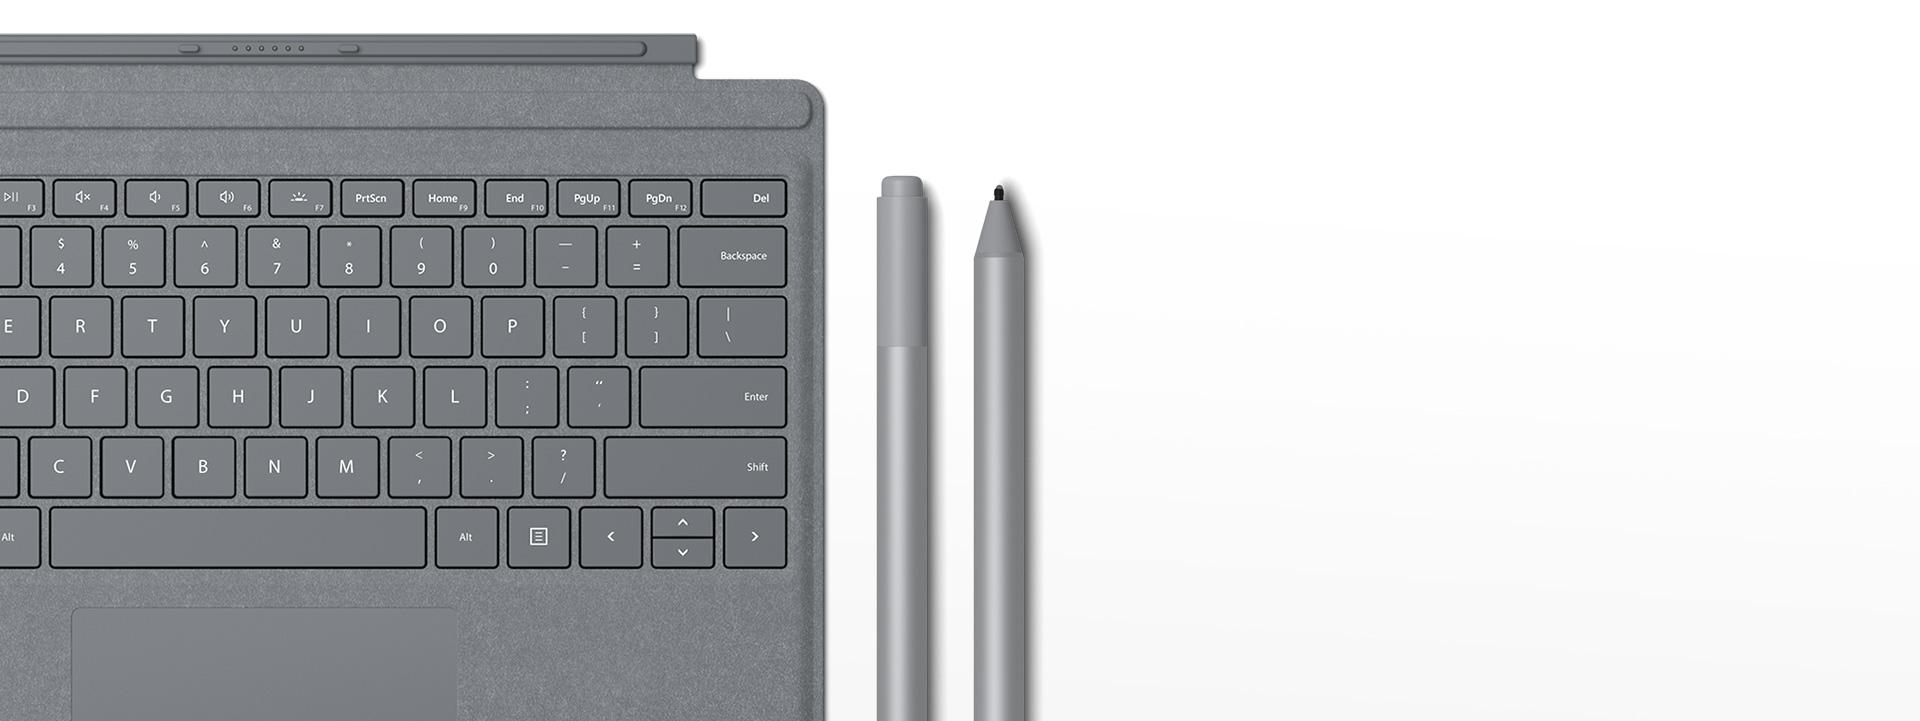 Klawiatura Type Cover do Surface Pro, pióro Surface, zestaw końcówek do pióra Surface